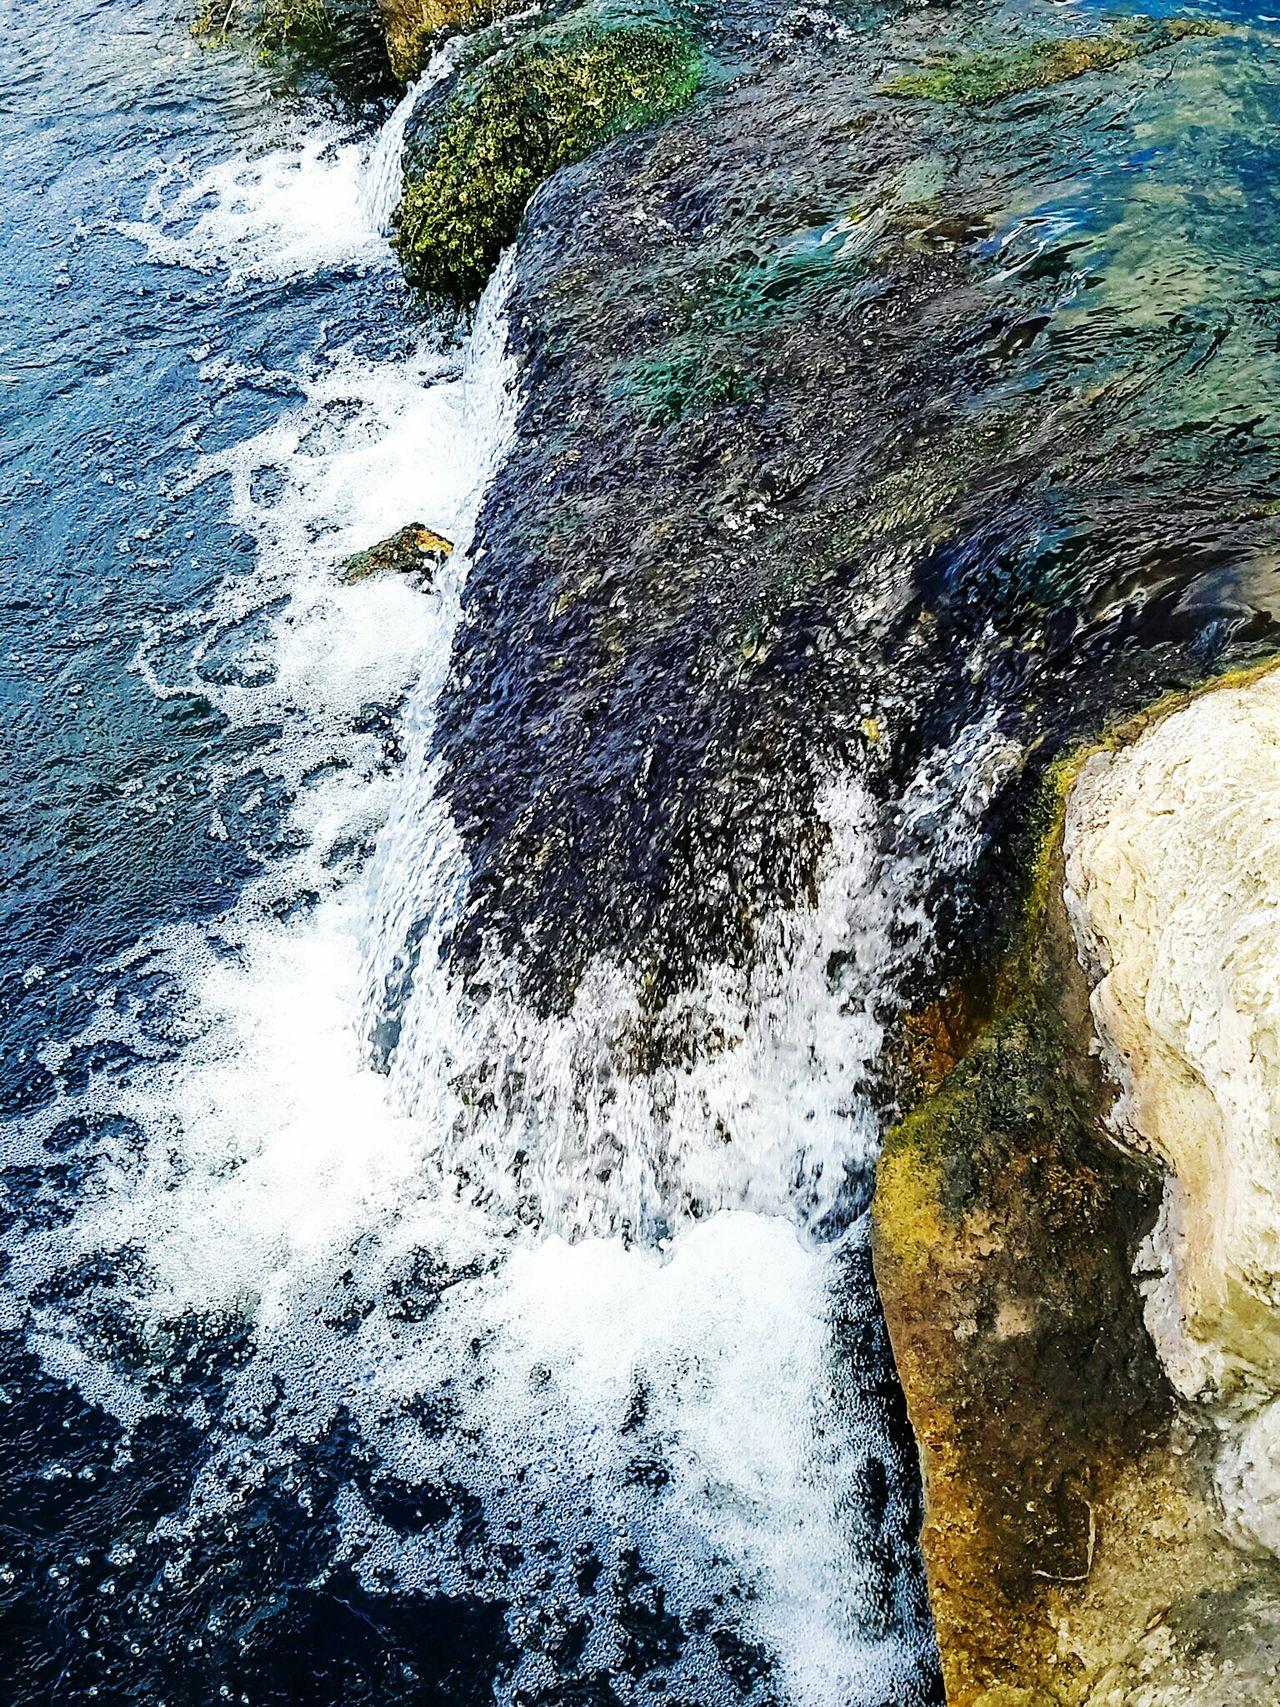 """Spring Falls"" Springfalls Water Close-up Day Wave Outdoors Nature Falls Spring Water Spring Water 2016"